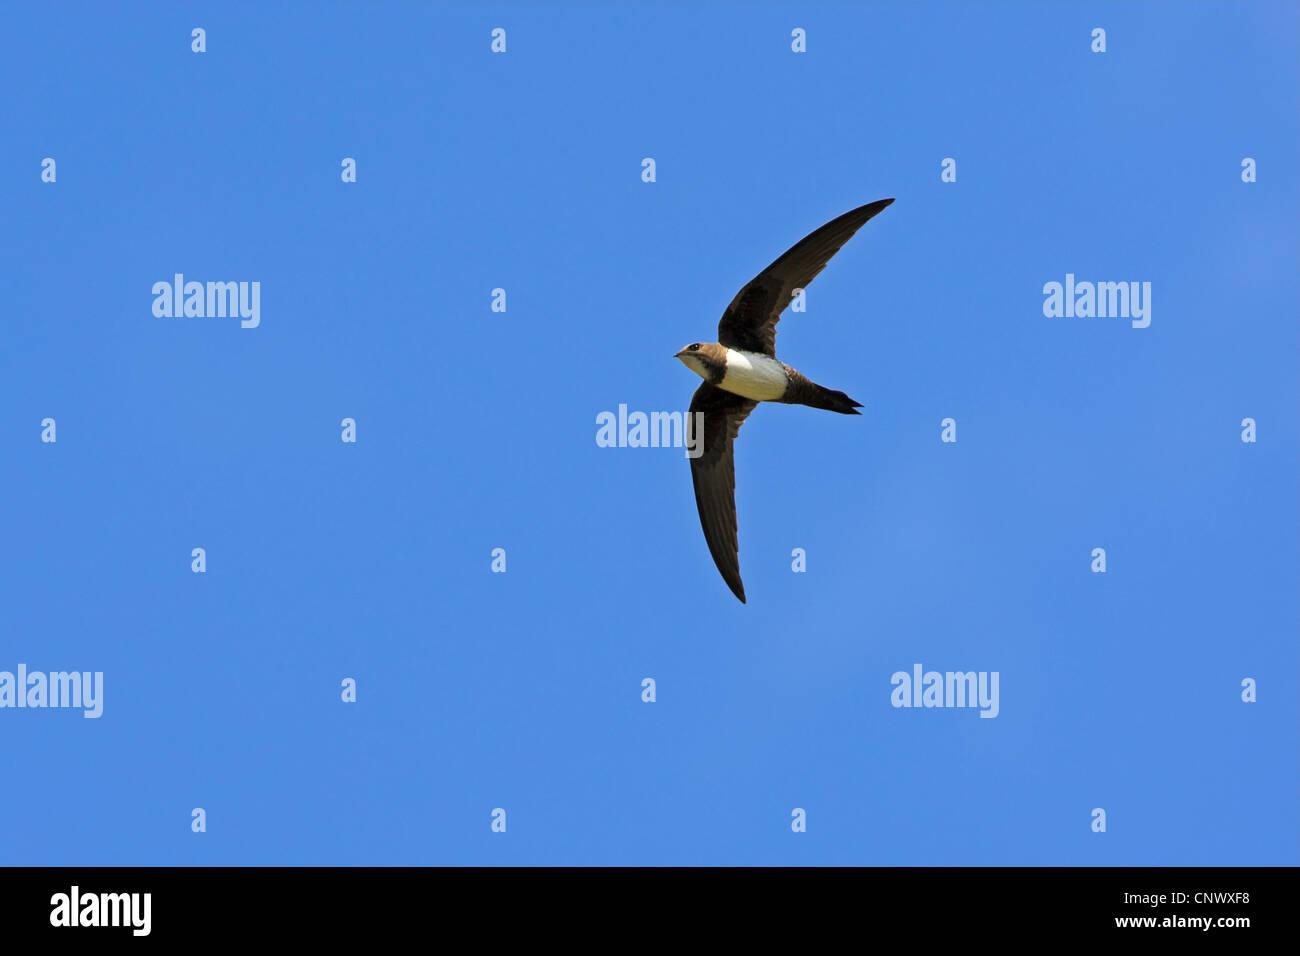 alpine swift (Apus melba, Tachymarptis melba), flying, Greece, Lesbos, Eressos Stock Photo